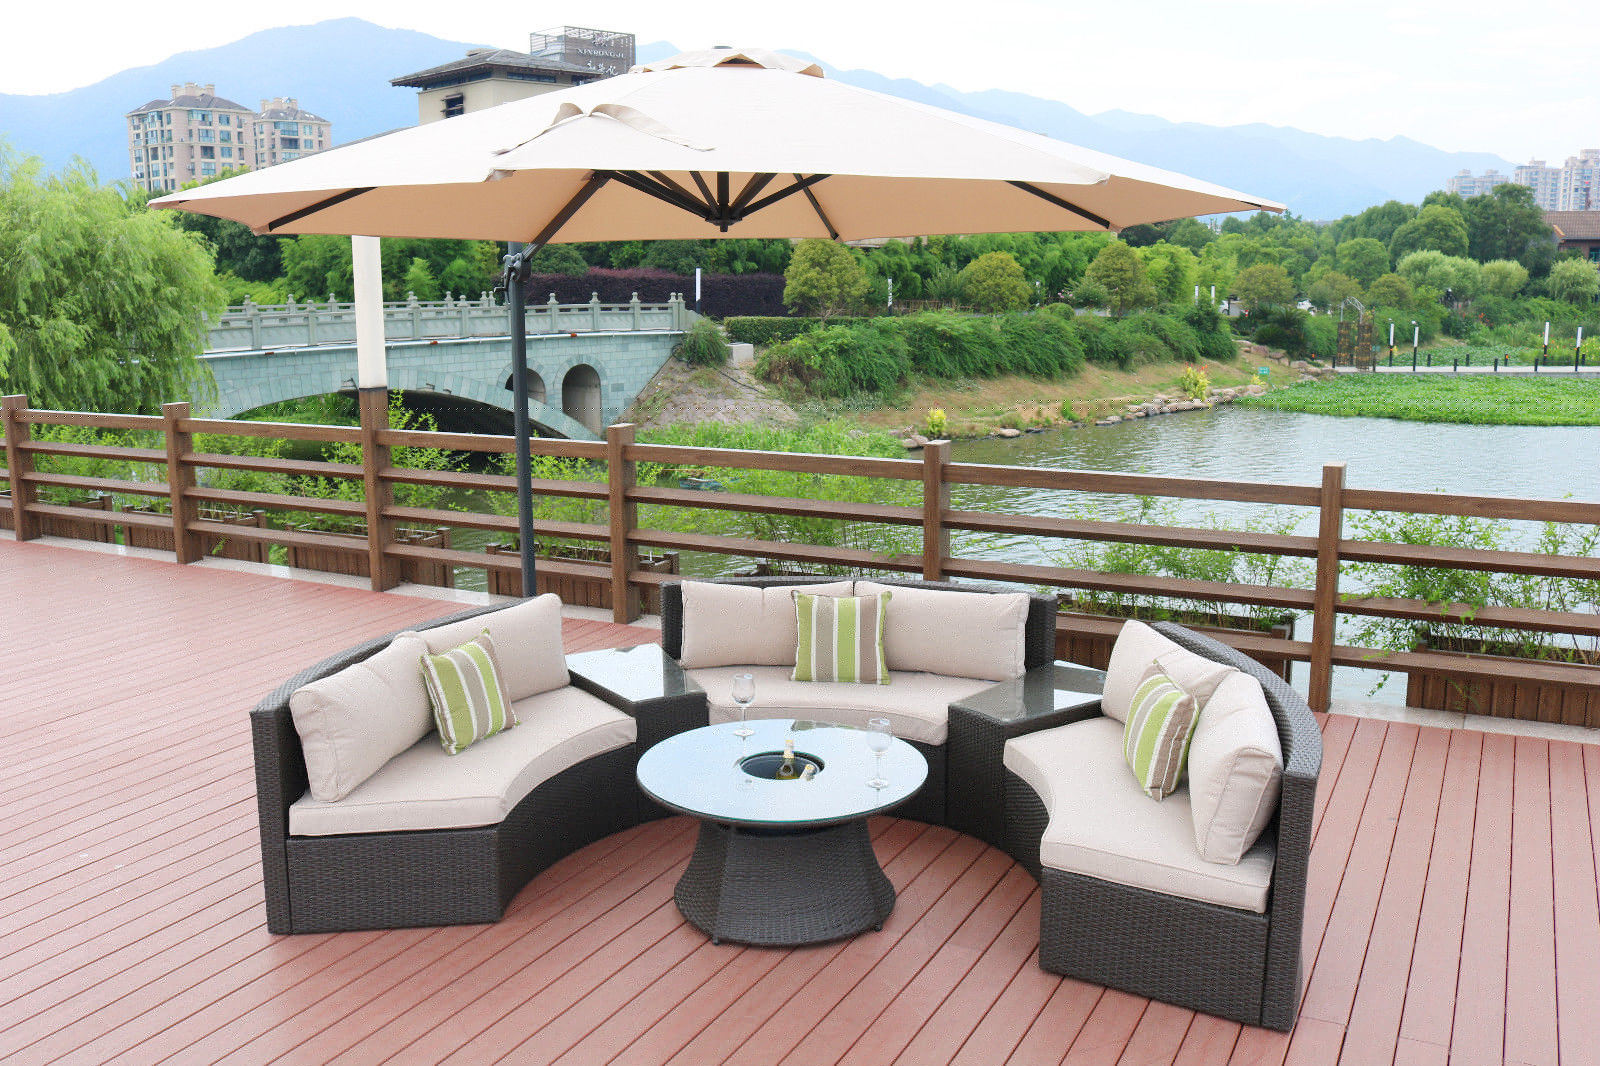 [Hot Item] Update New Design Half Round Outdoor Rattan Sofa Patio Furniture  Garden Sets